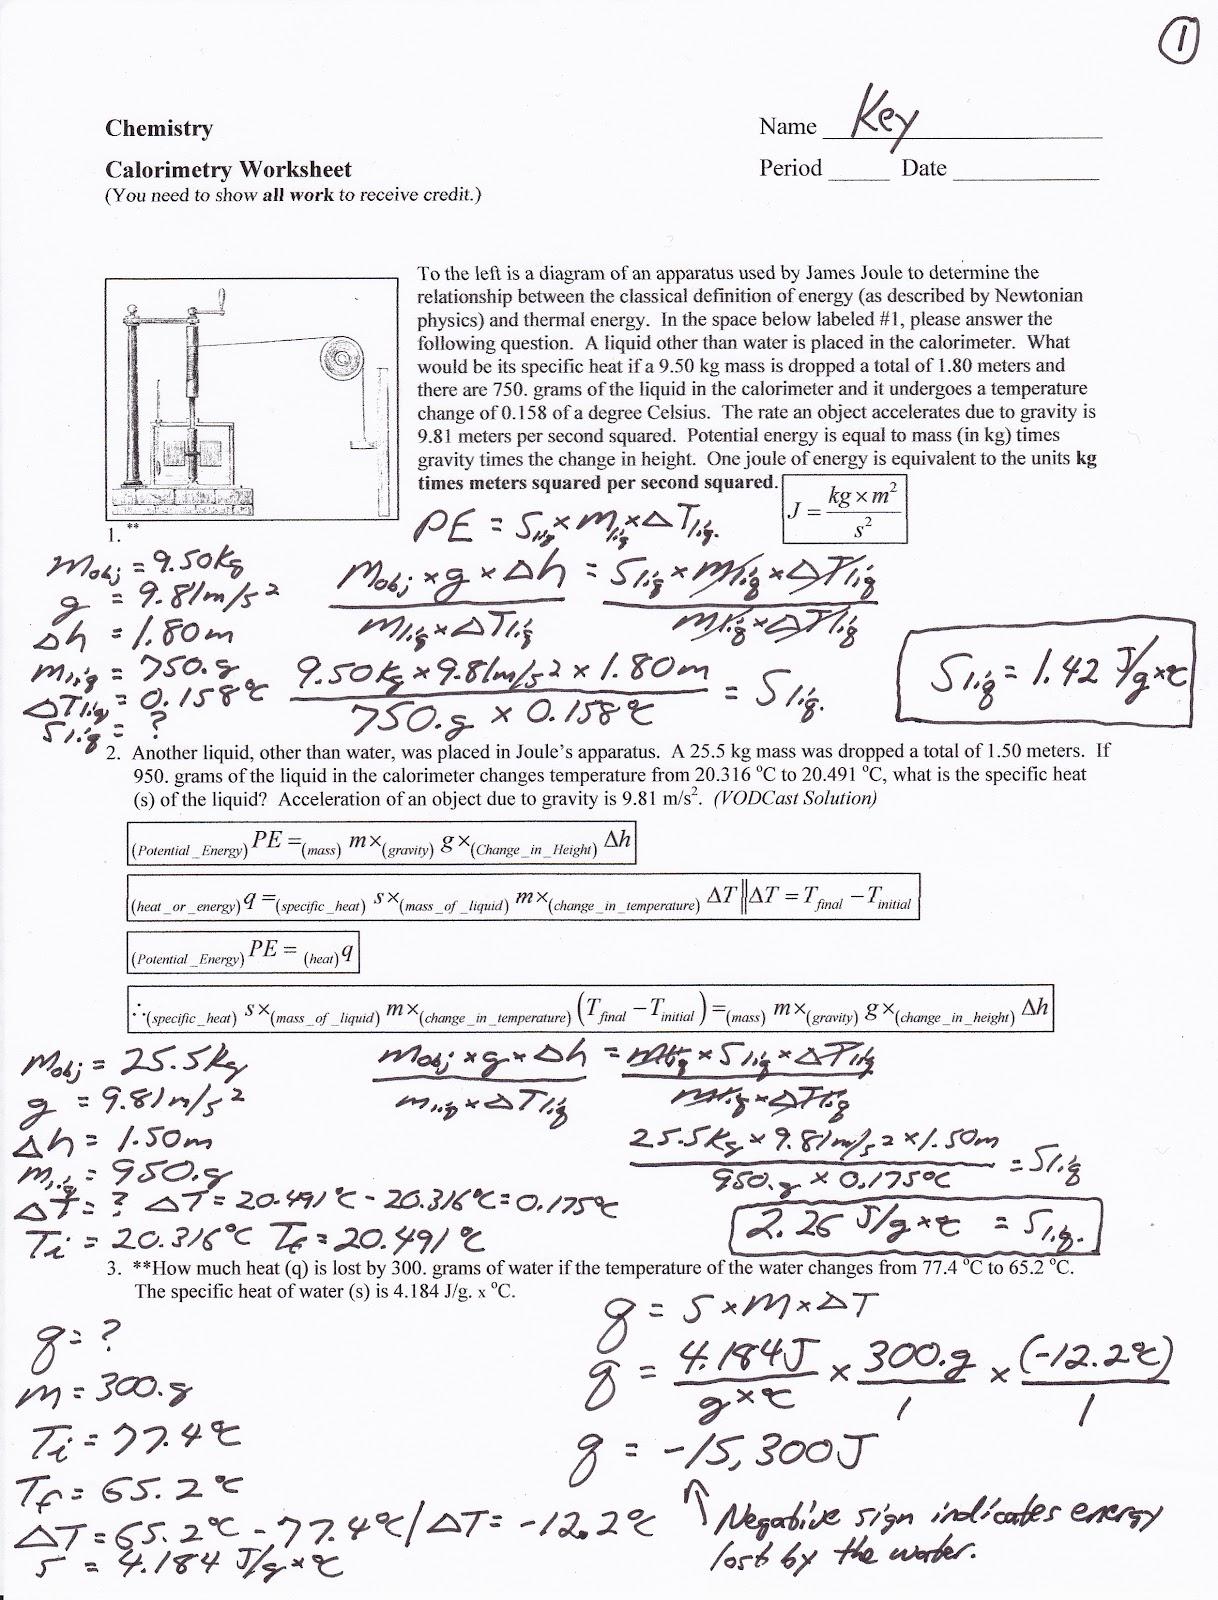 Mr. Brueckner's Chemistry Class 2012 / 2013 Images - Frompo